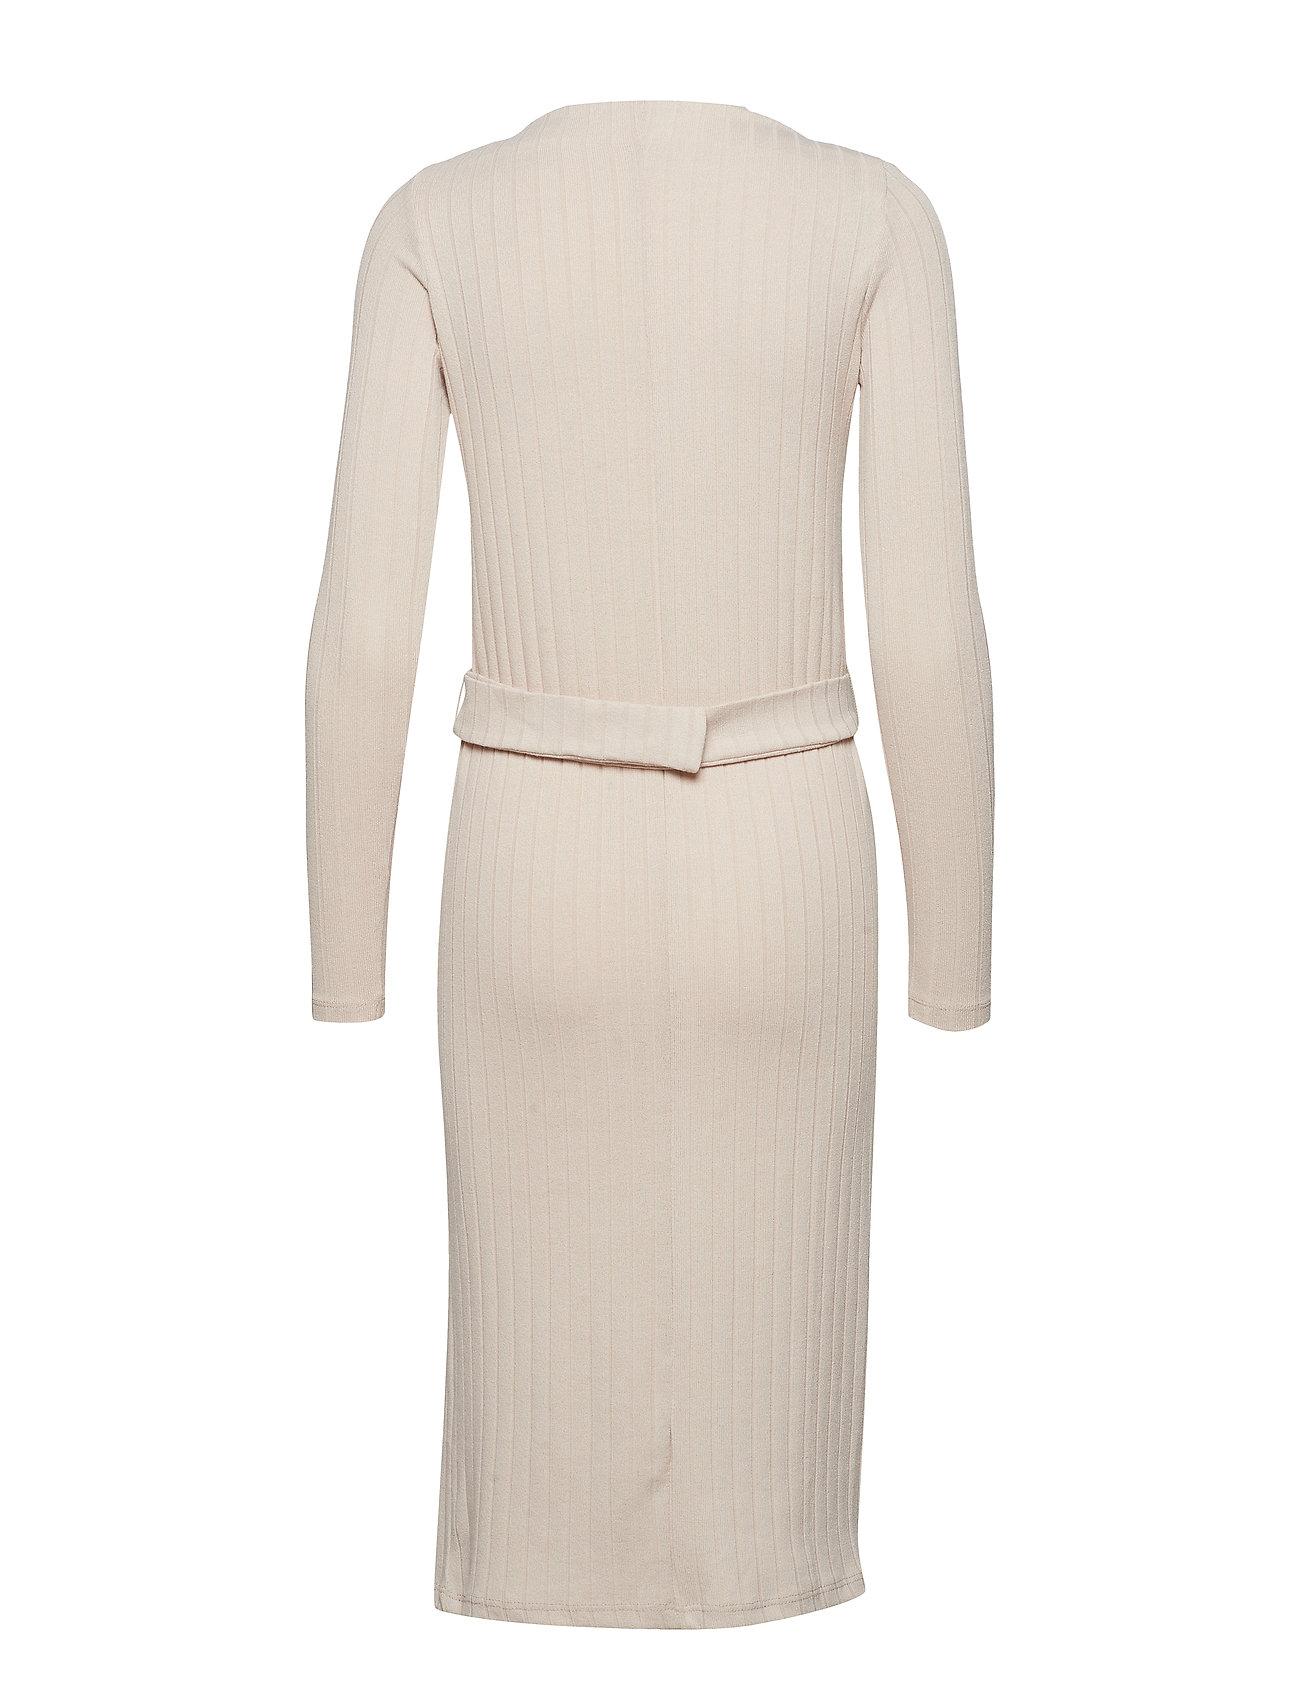 4e07dca29b94 Sort Mango Belt Ribbed Dress strikkjoler for dame - Pashion.dk